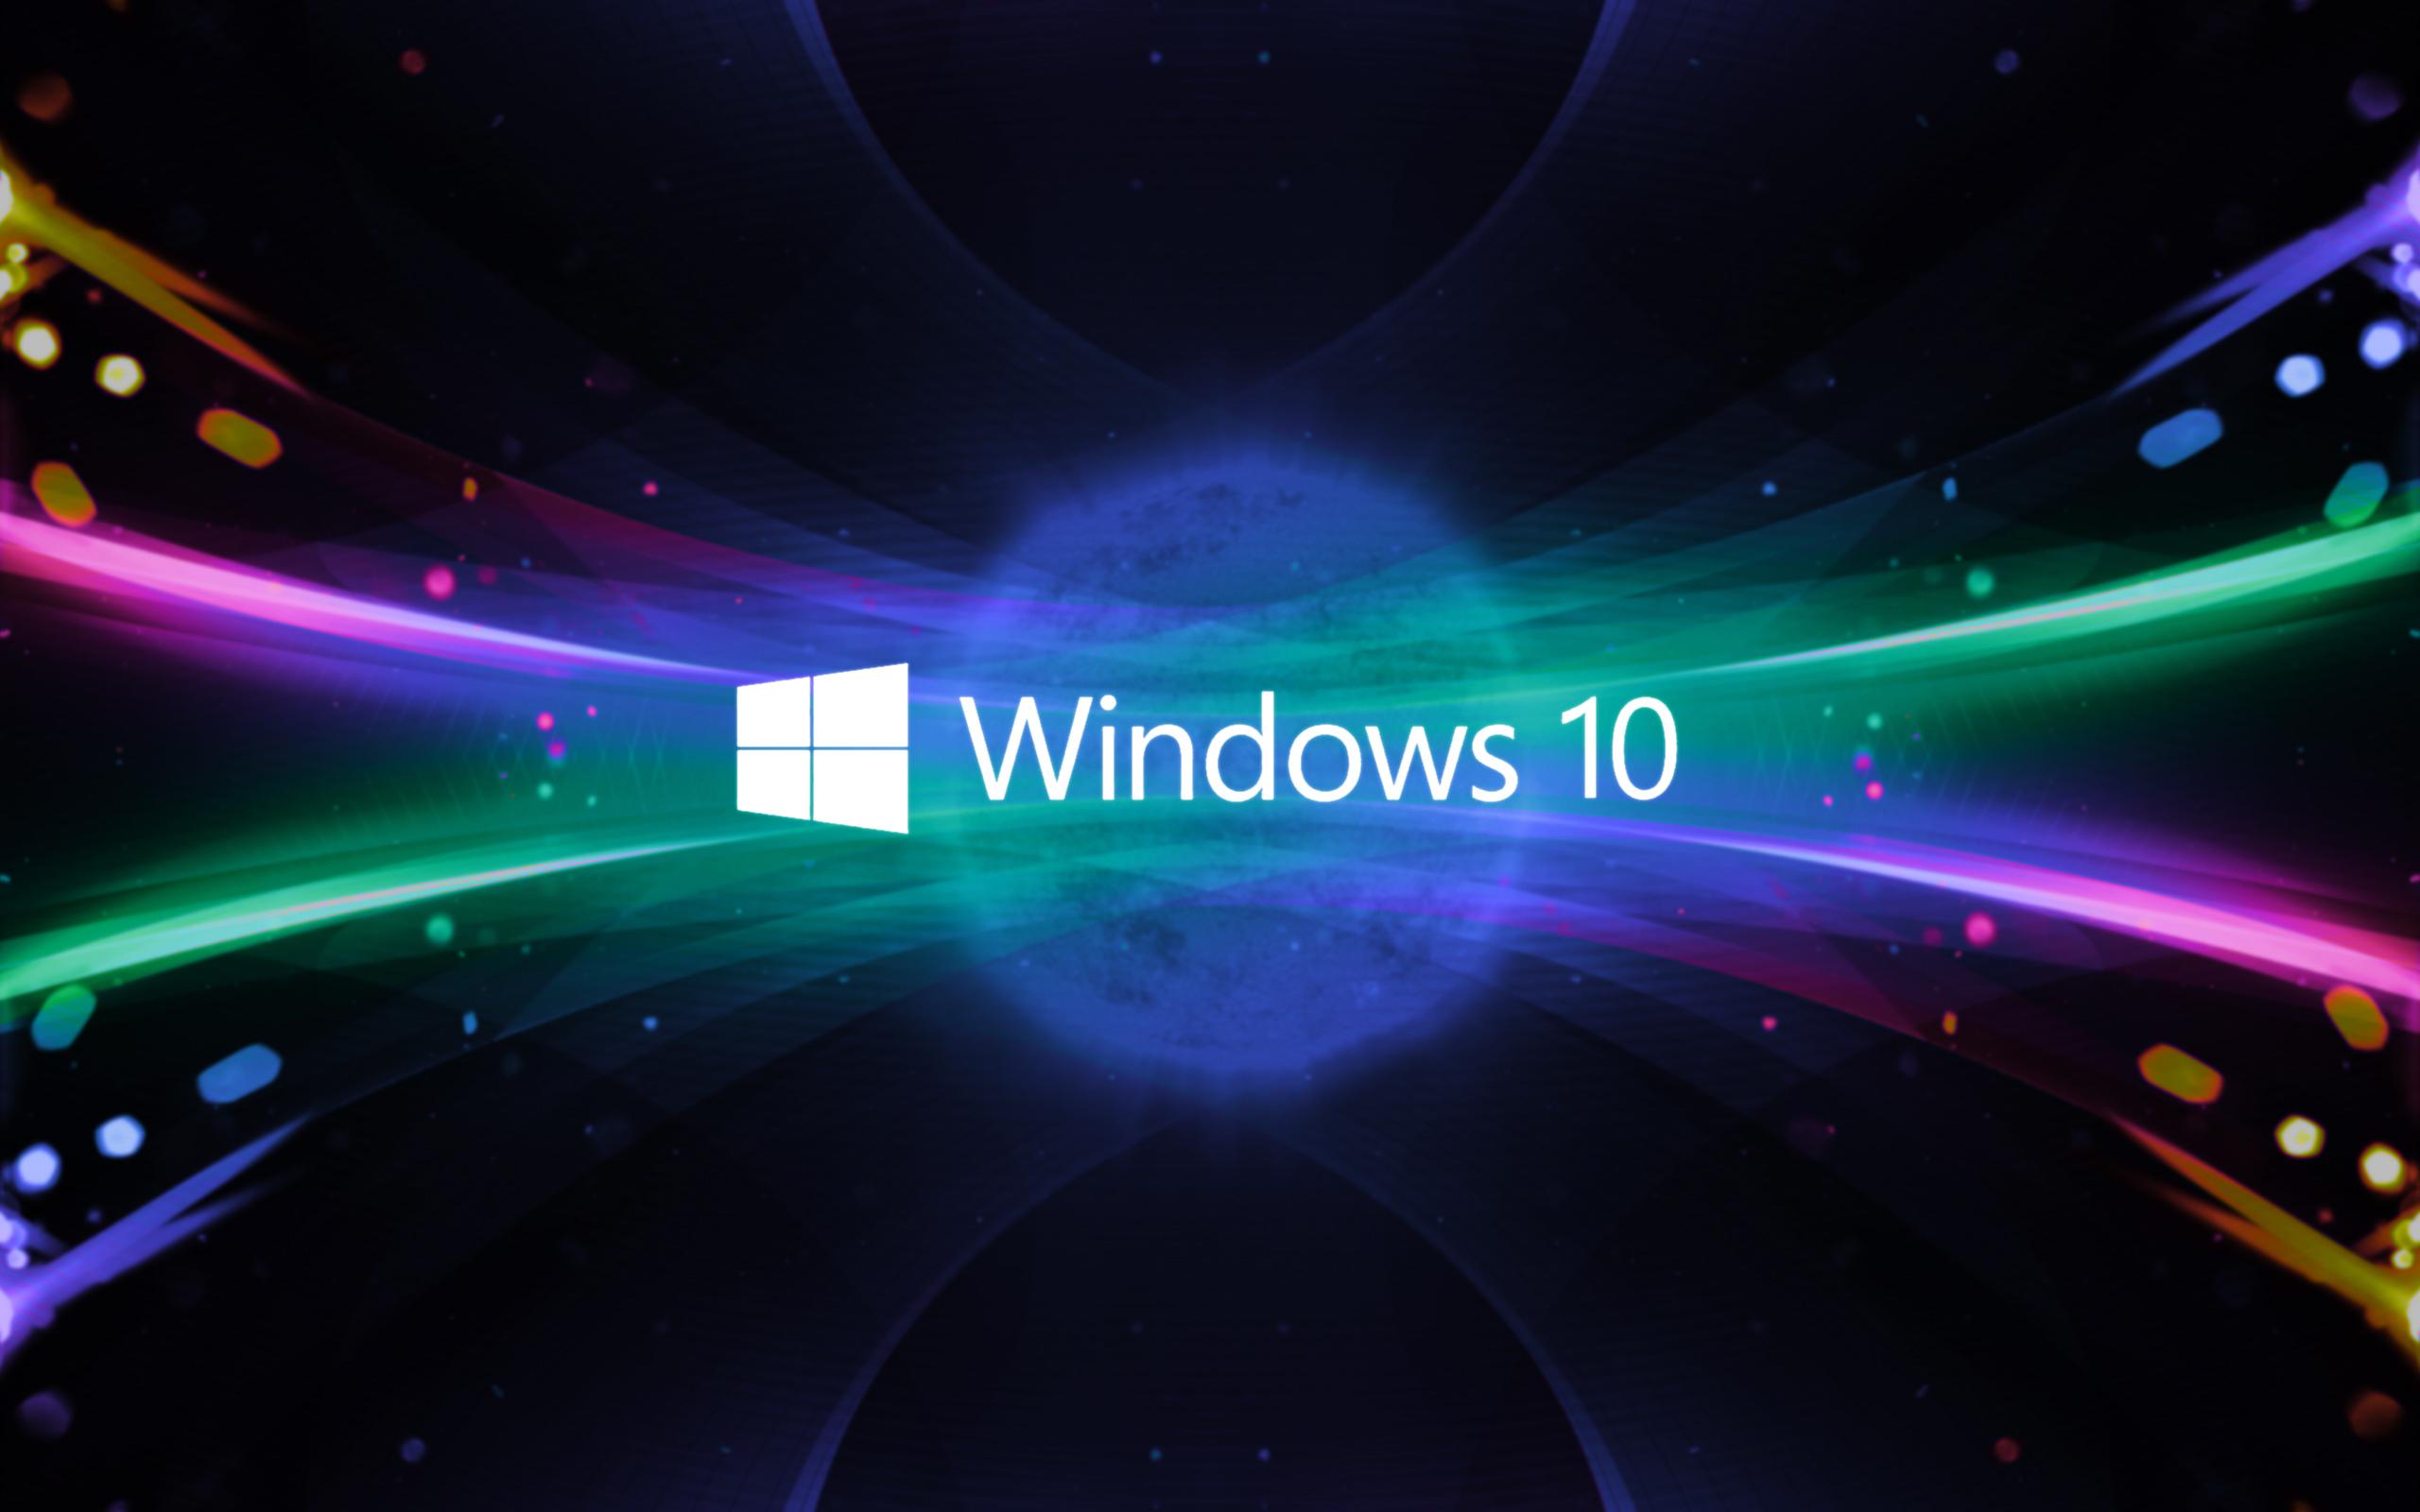 Windows 8.1 Wallpapers